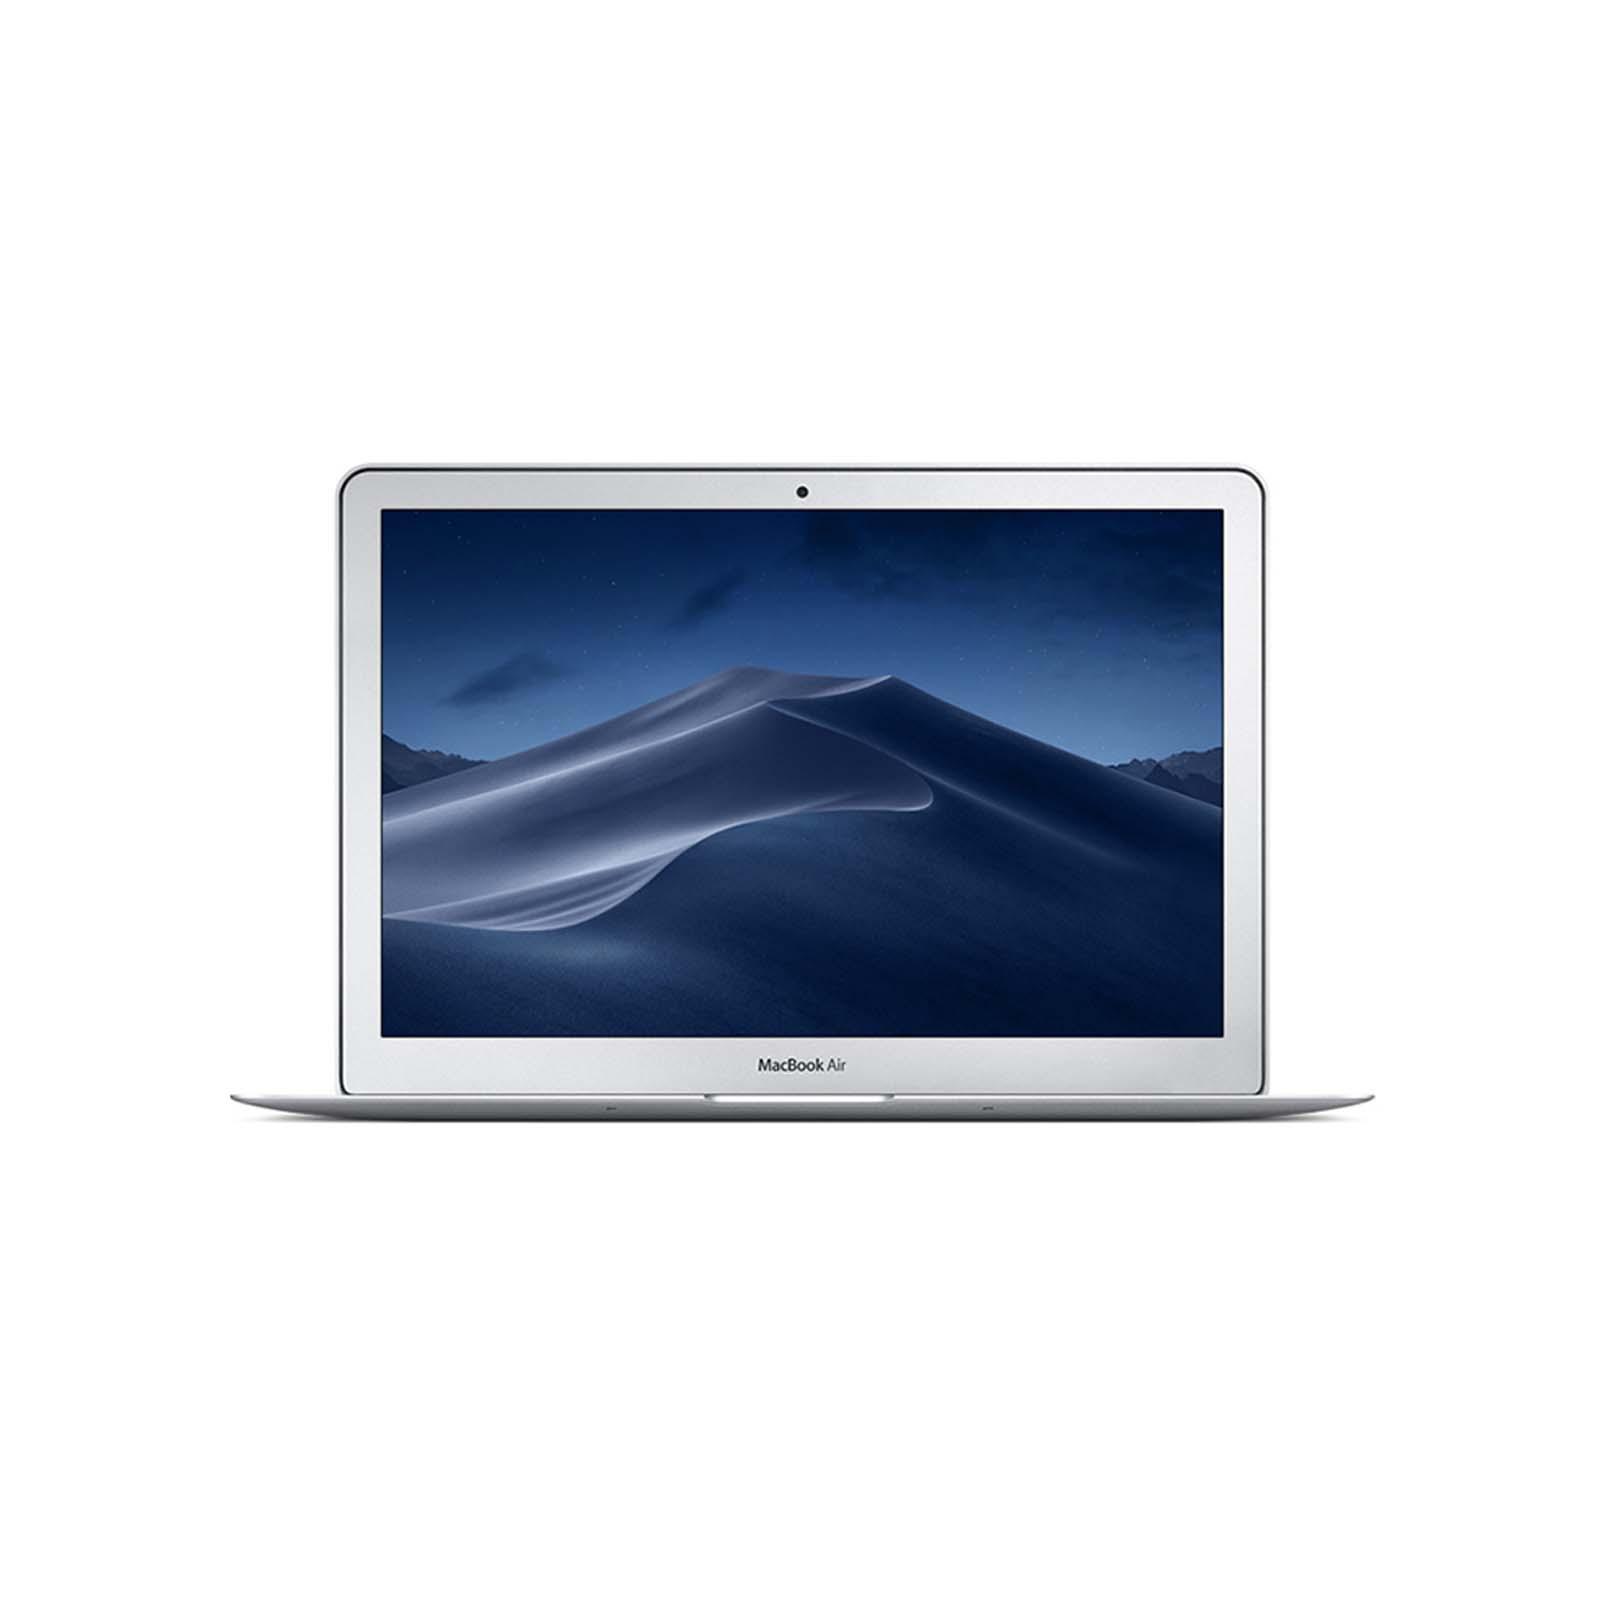 MacBook Air inch